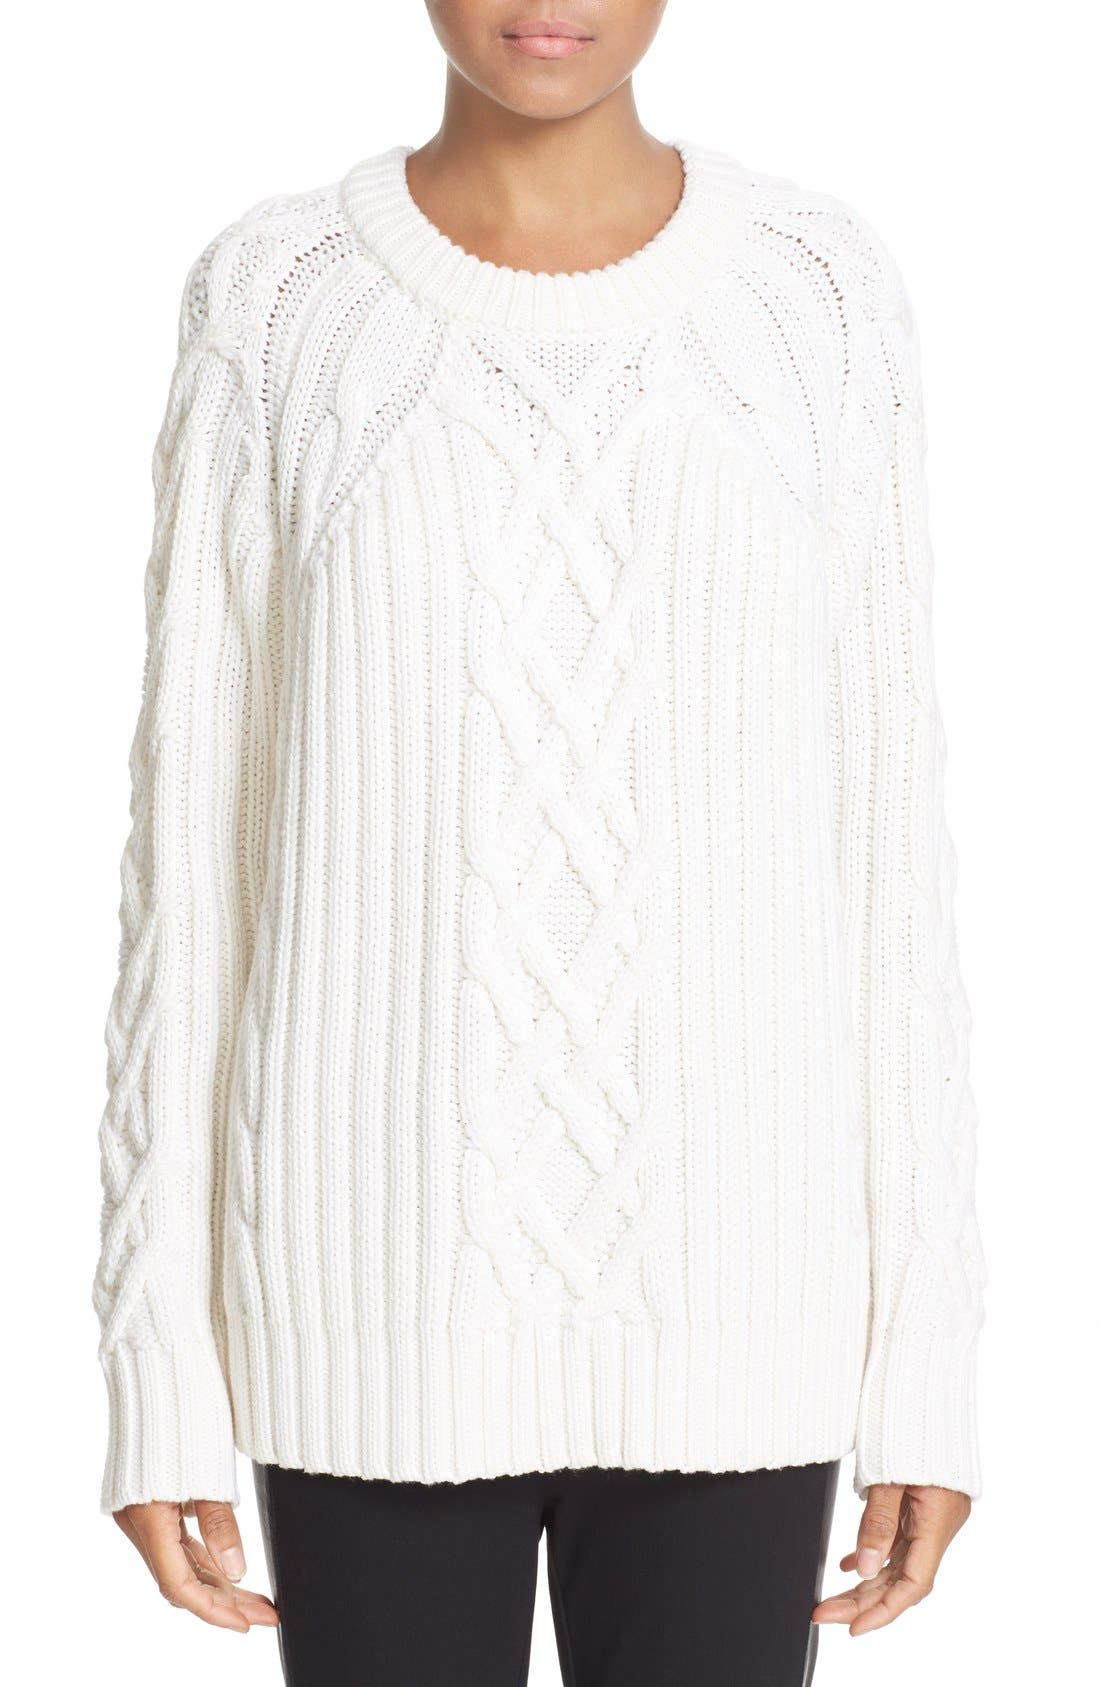 Alternate Image 1 Selected - rag & bone 'Kiera' Cable Knit Crewneck Sweater